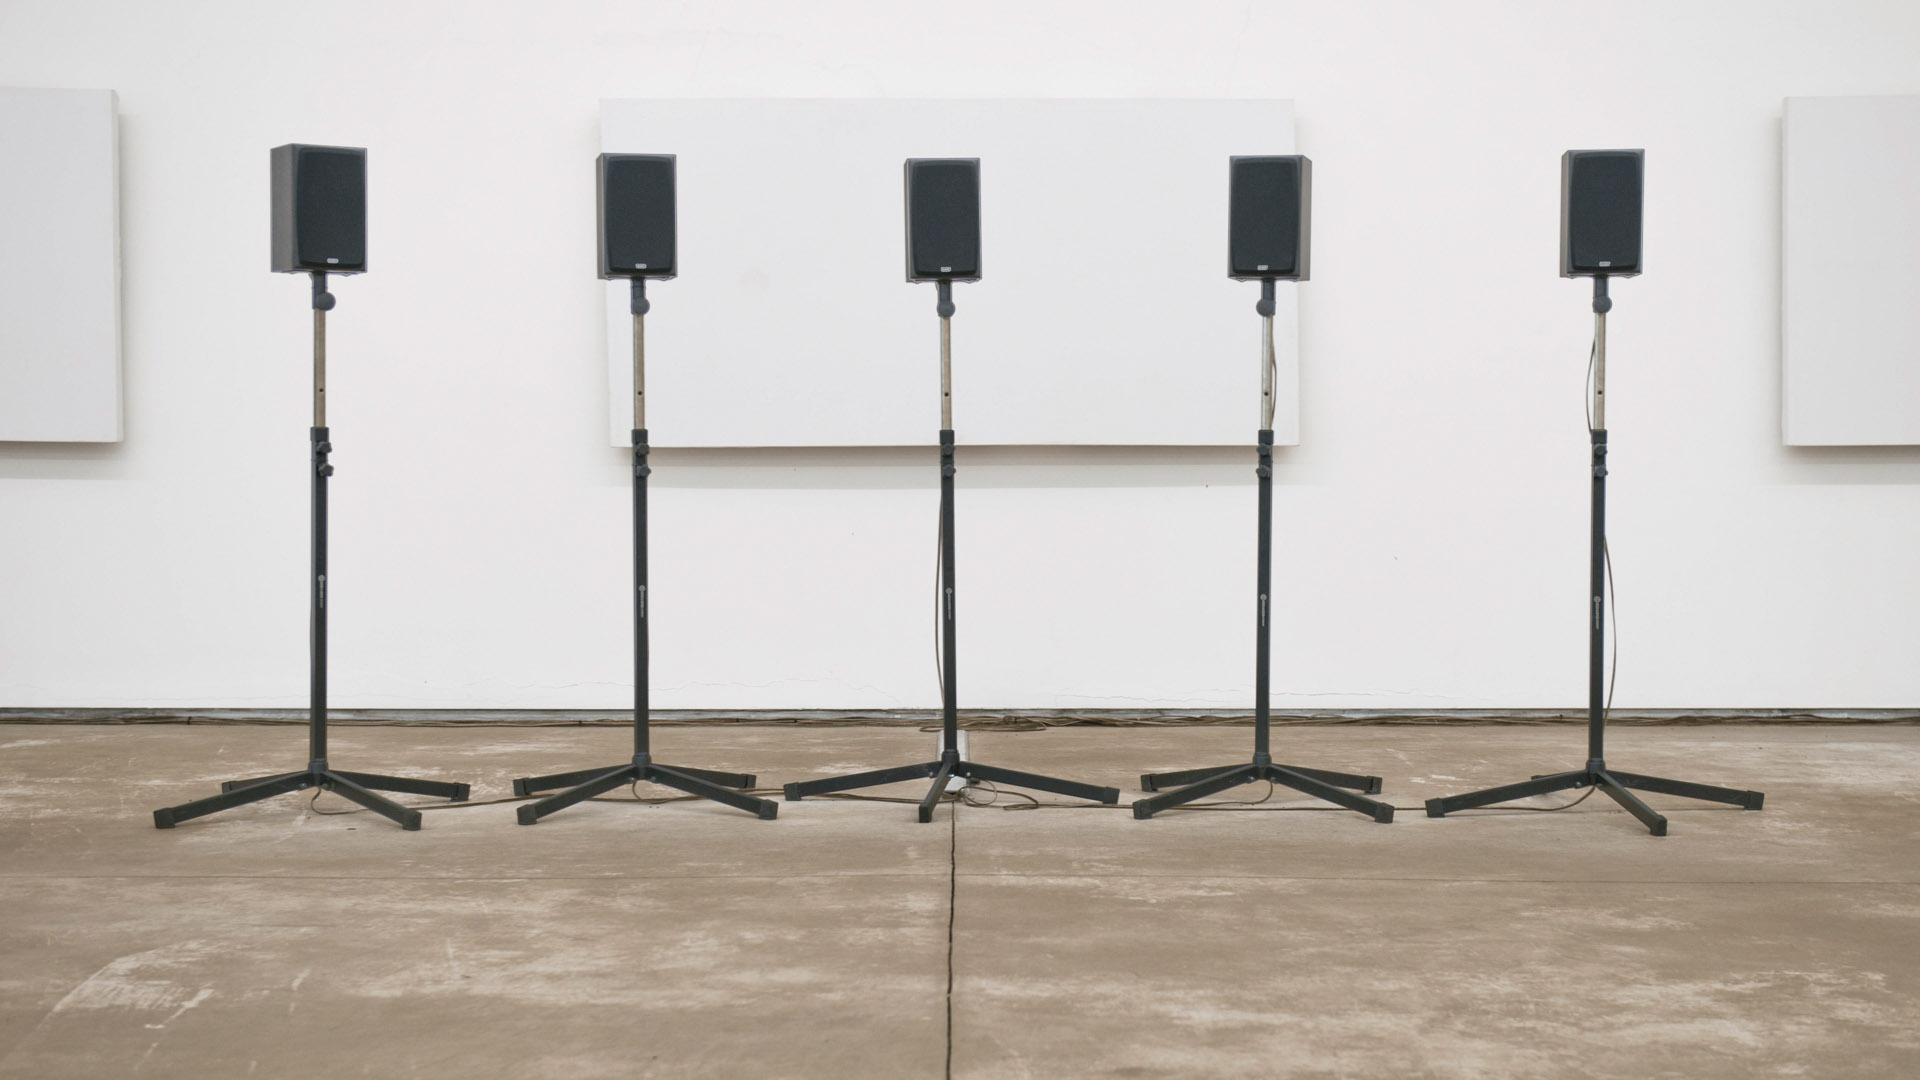 Forty Part Motet, 2001 de Janet Cardiff. Acervo de arte contemporânea Inhotim